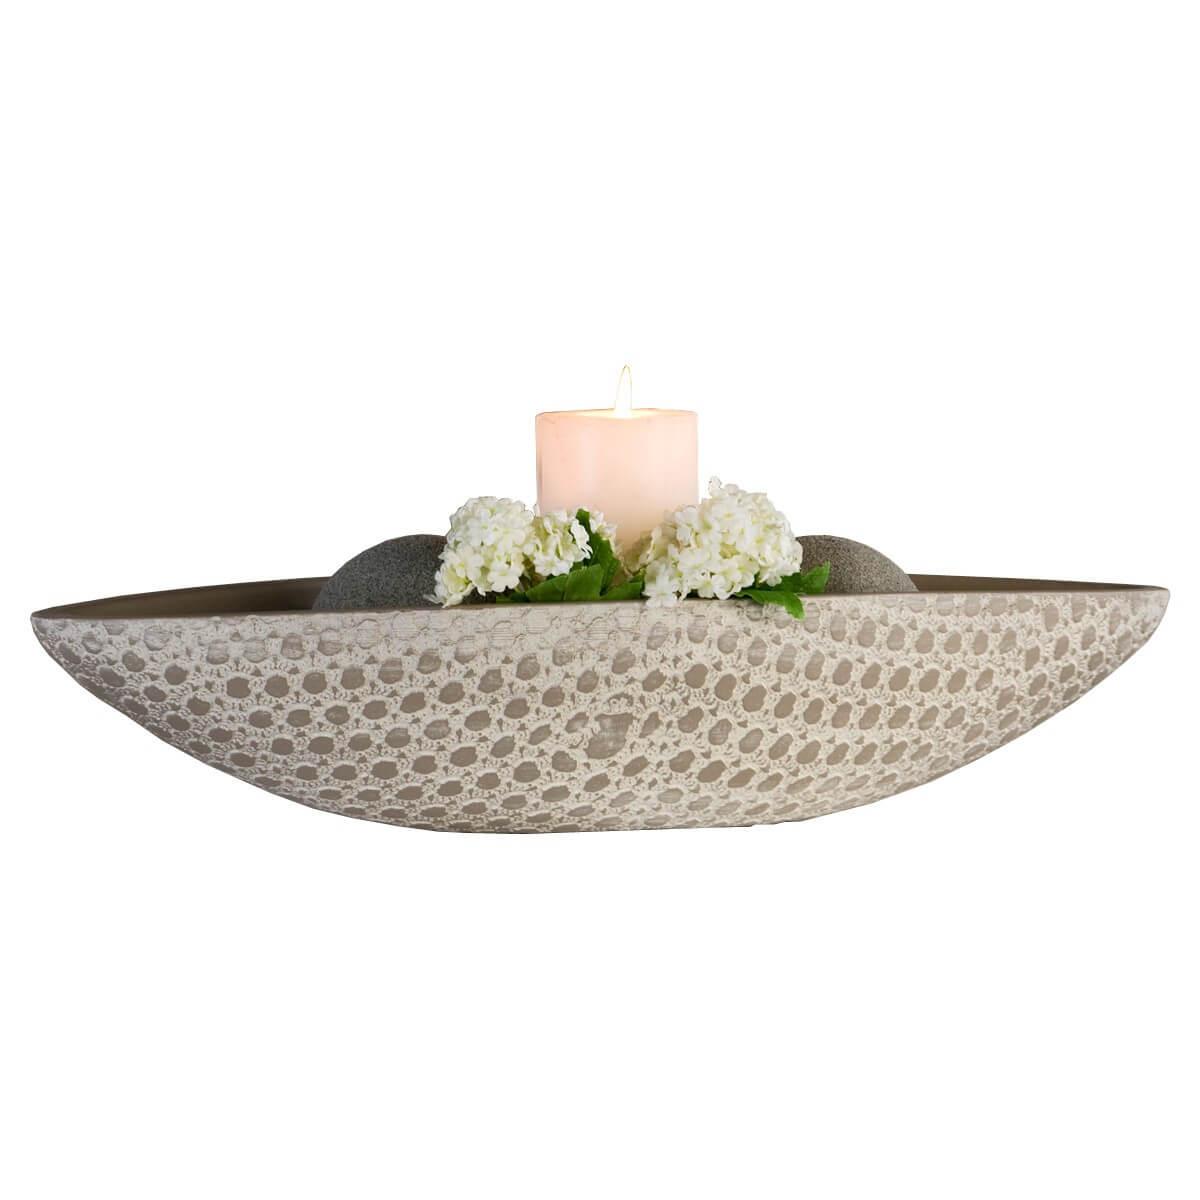 25868 deko schale keramik grau m bel24 for Moebel24 shop